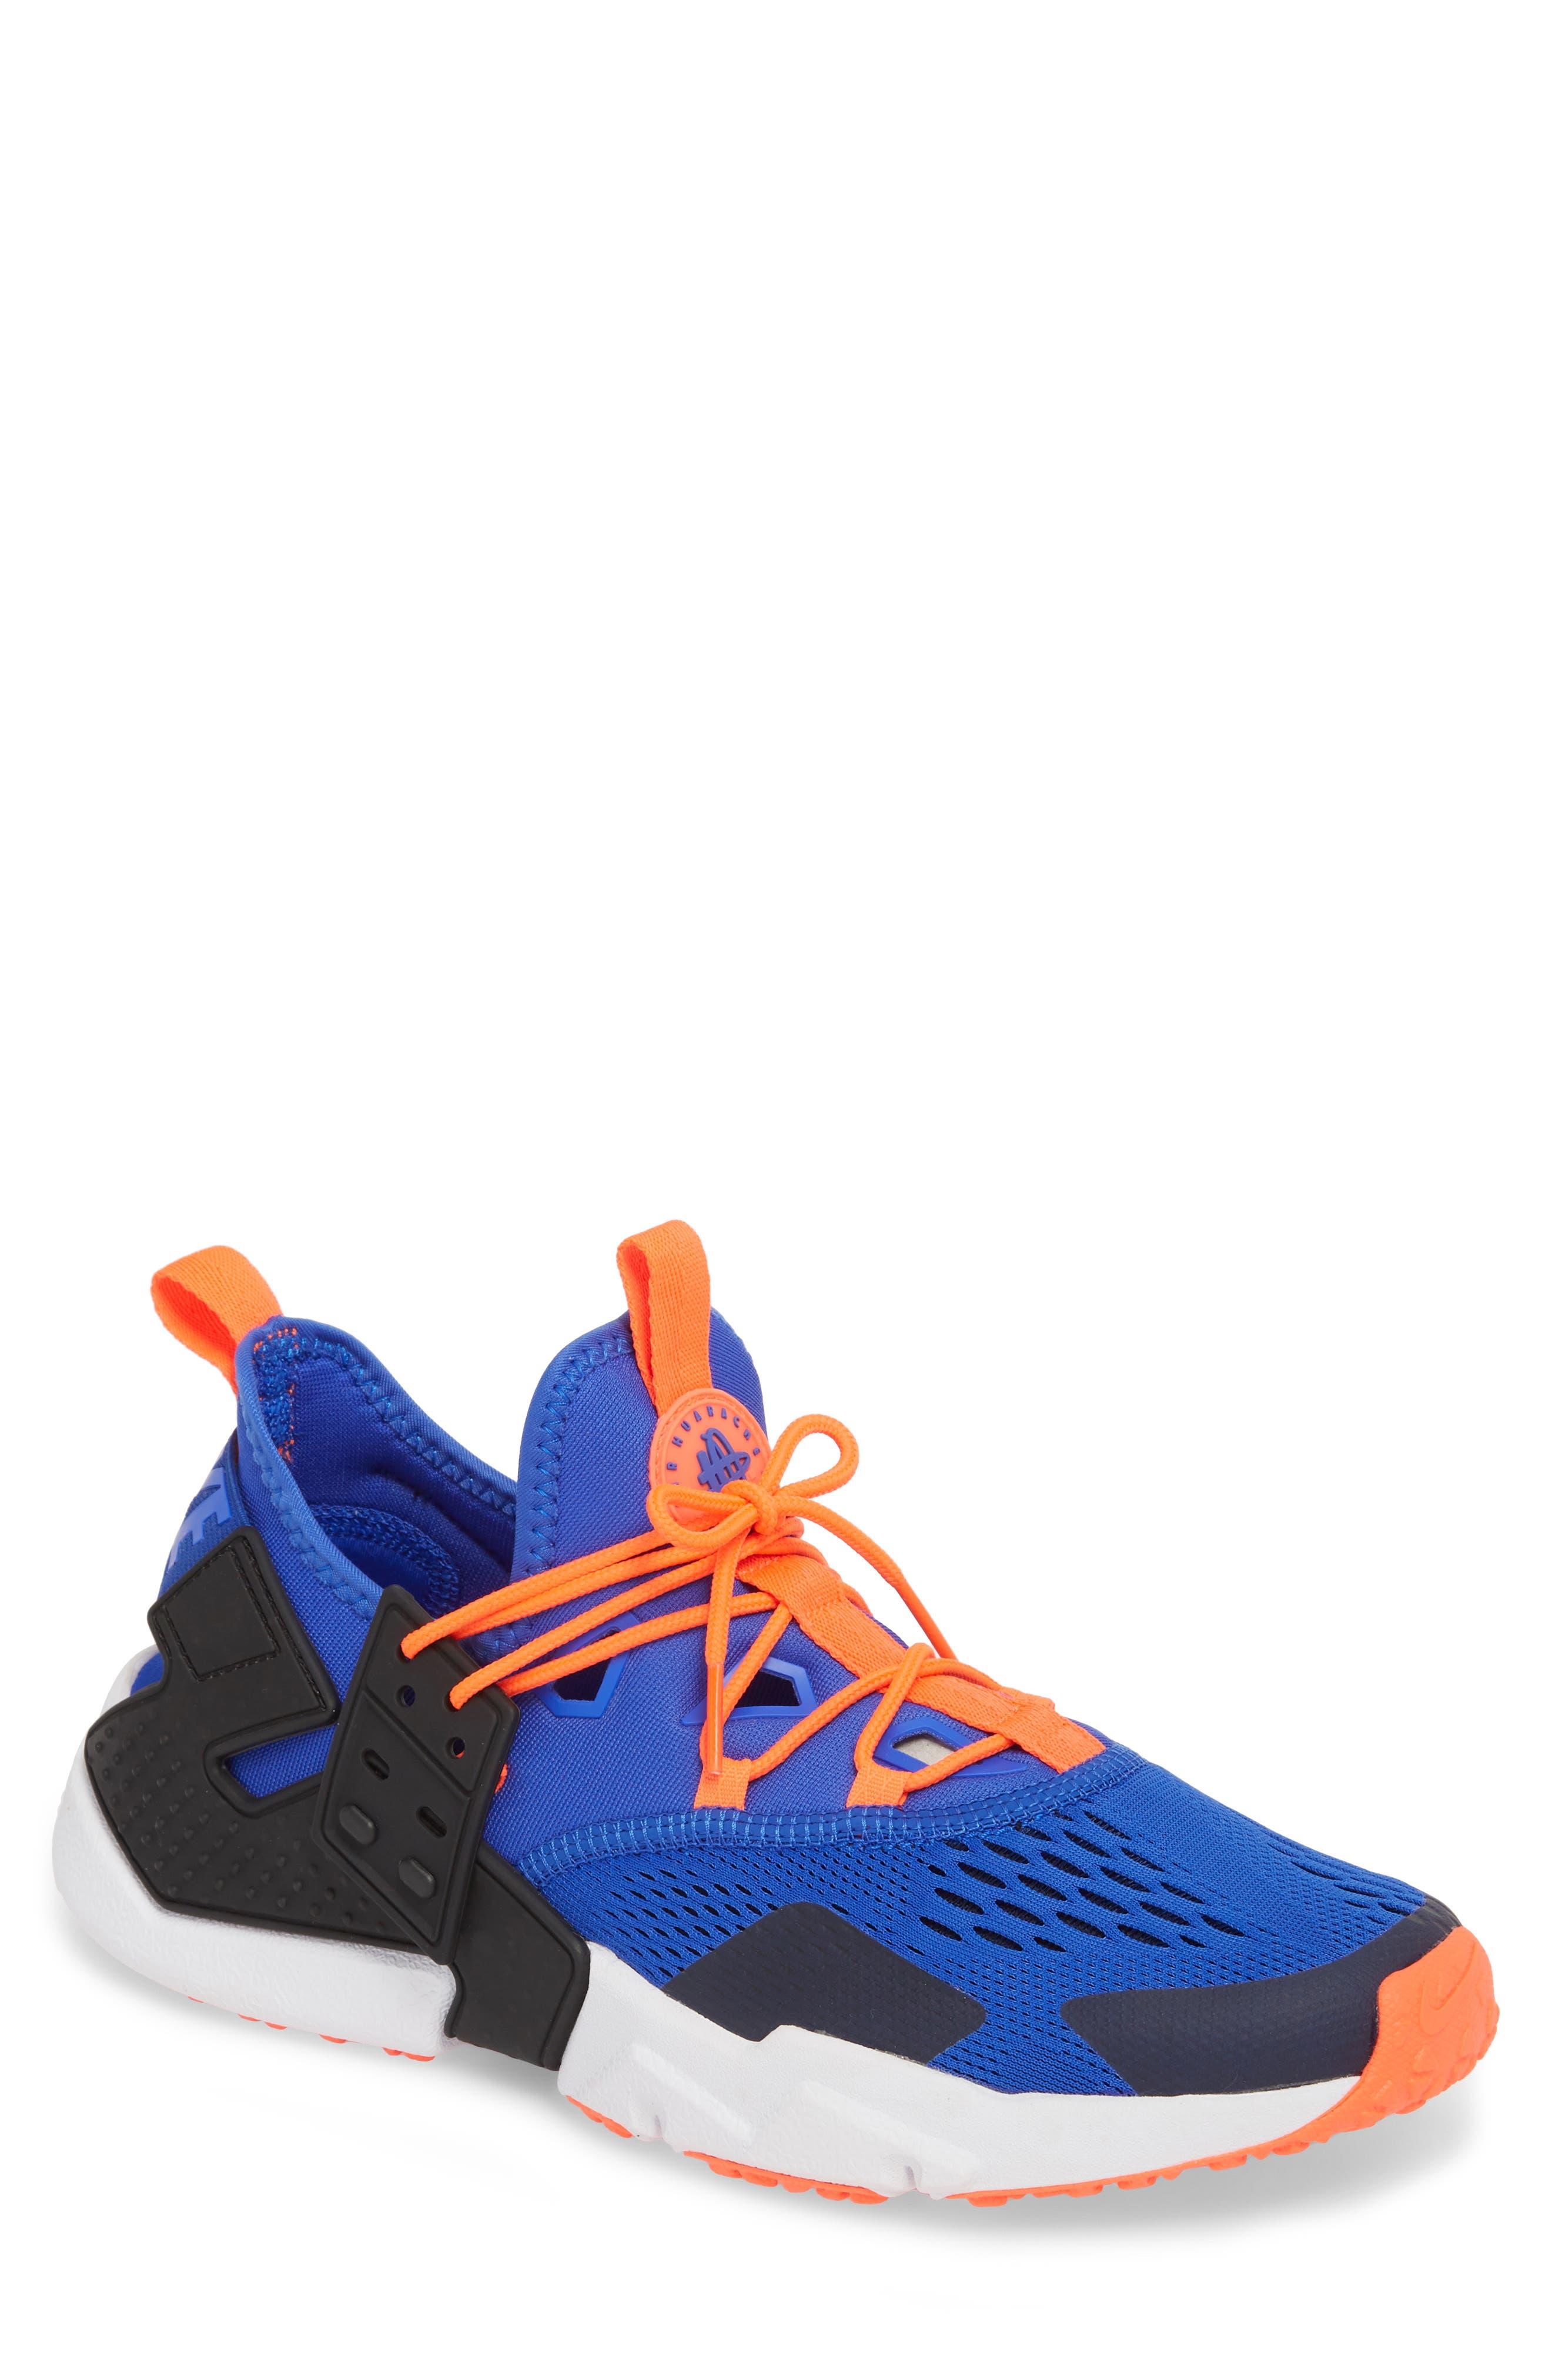 Nike Air Huarache Drift BR Sneaker (Men)